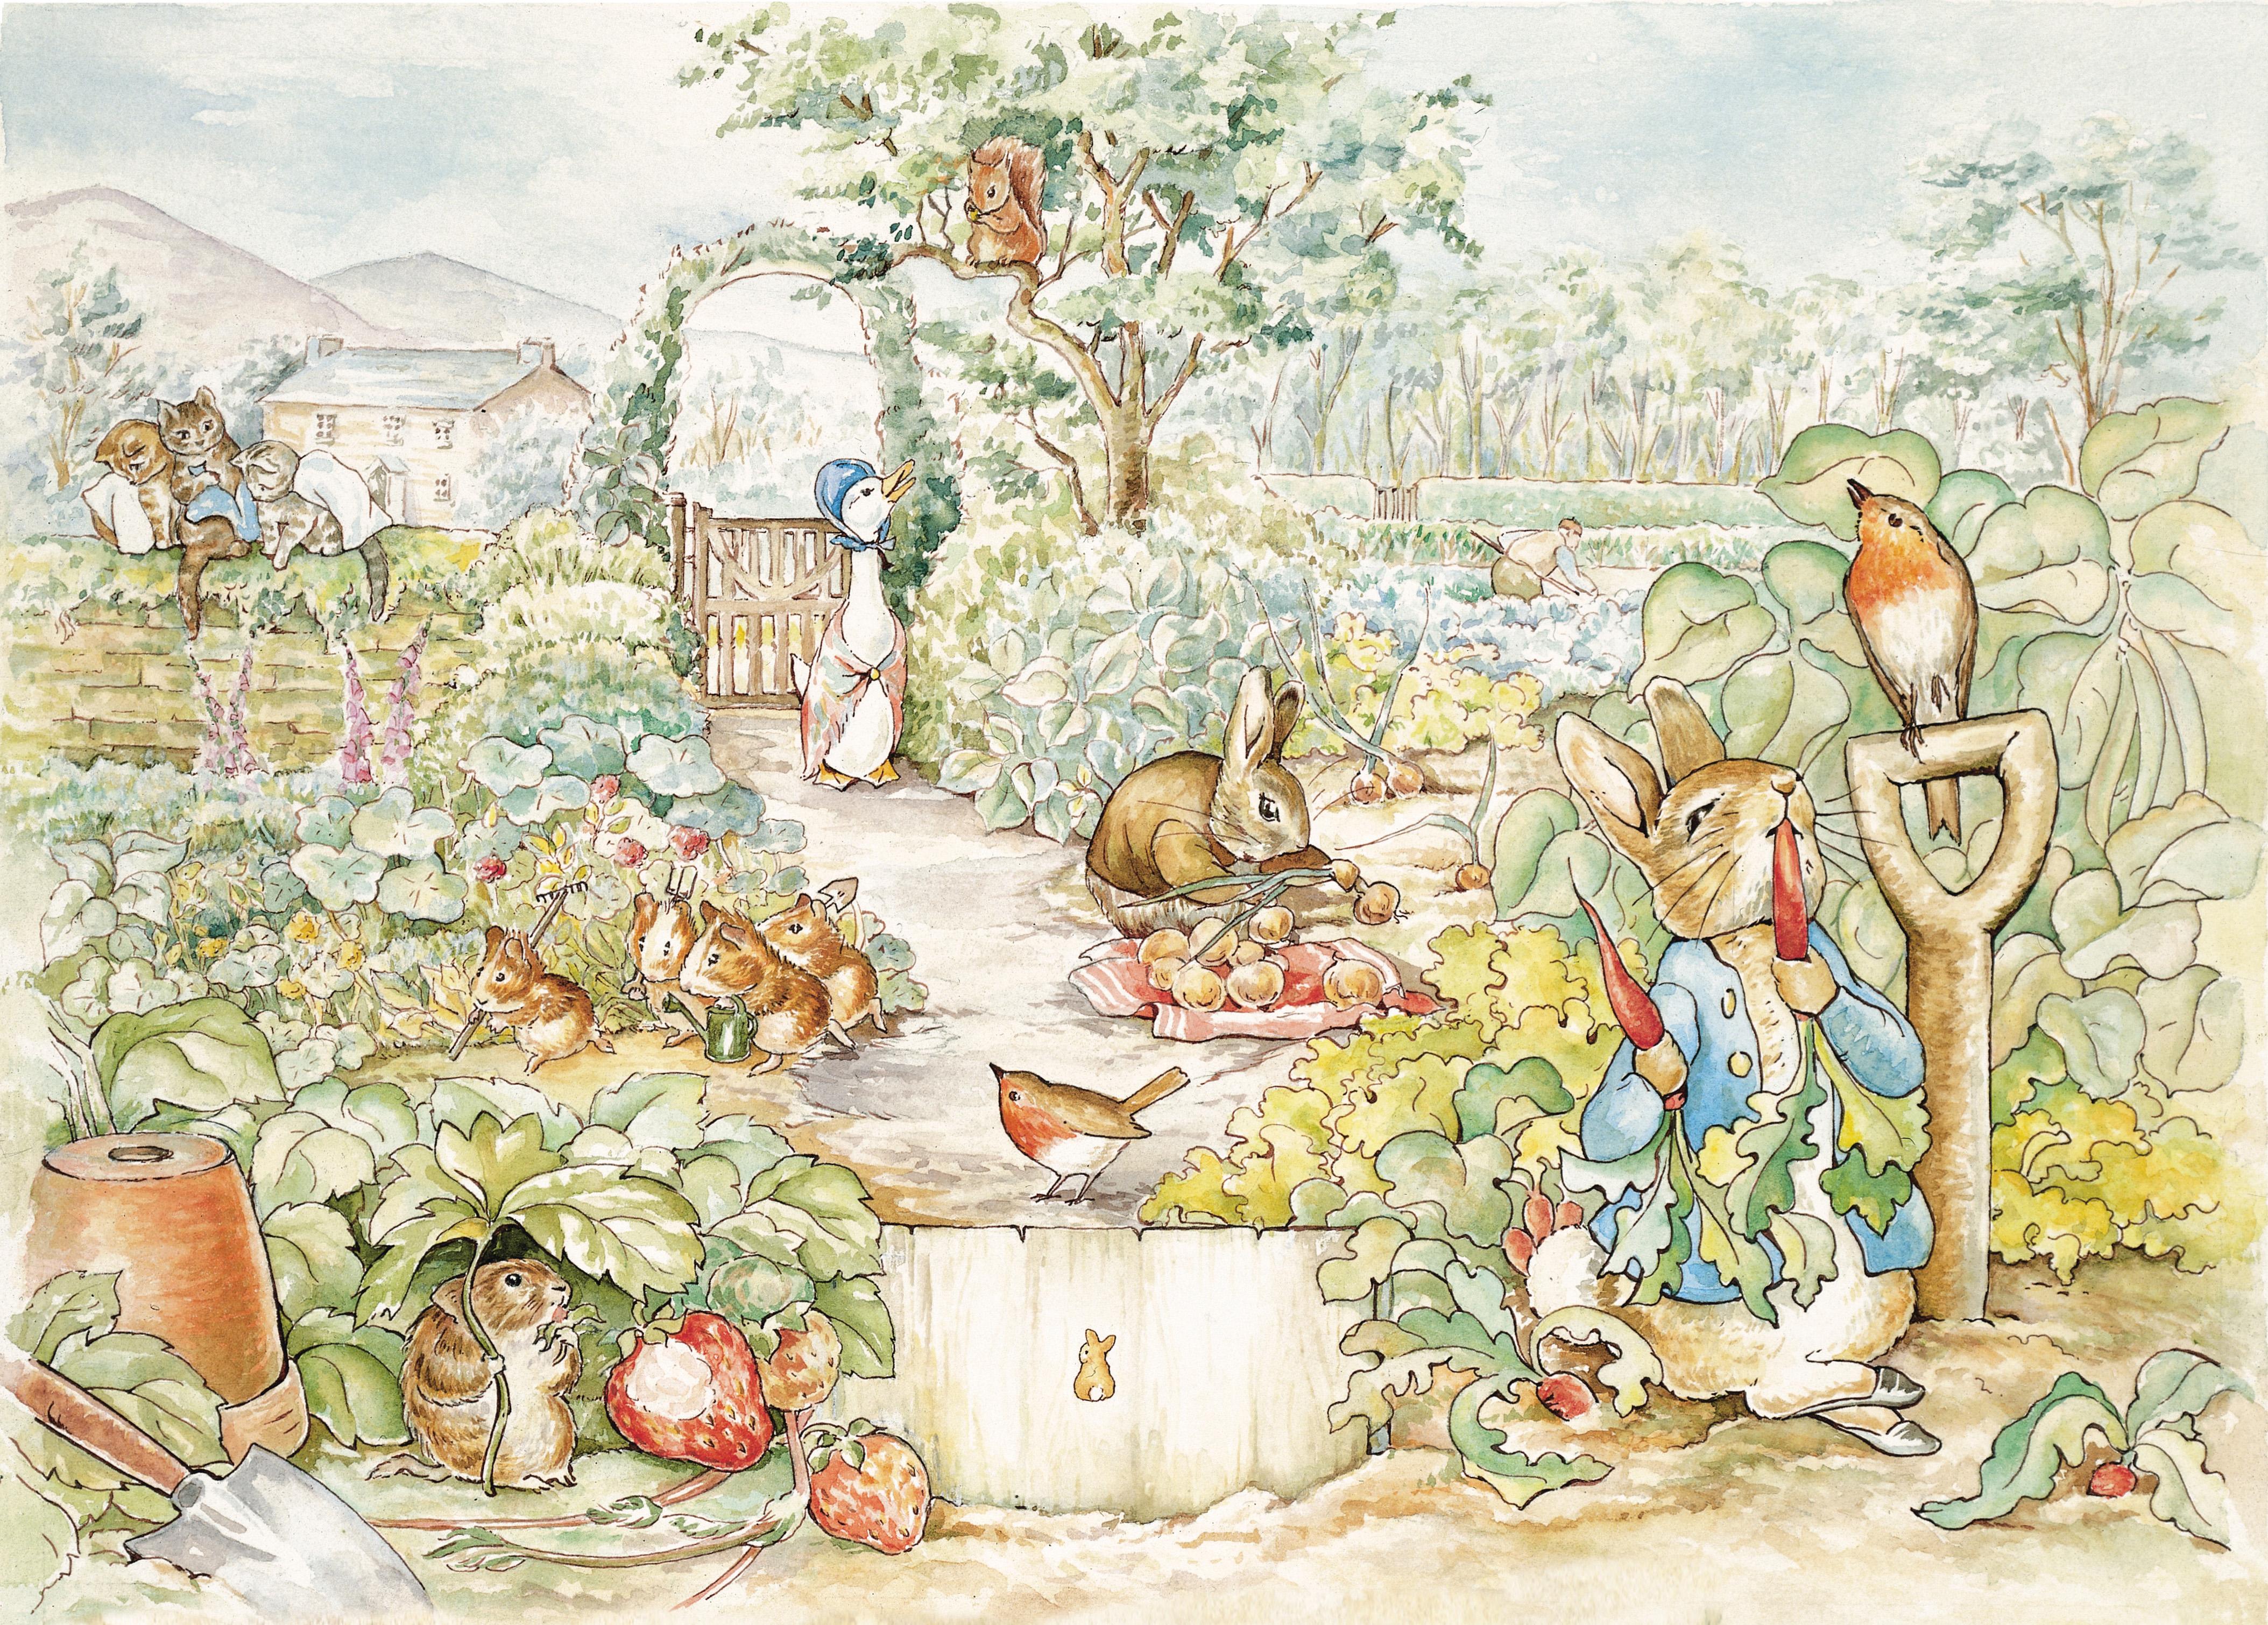 Peter Rabbit Wall Mural Comics Y Animados Los Muertevideanos P 225 Gina 7